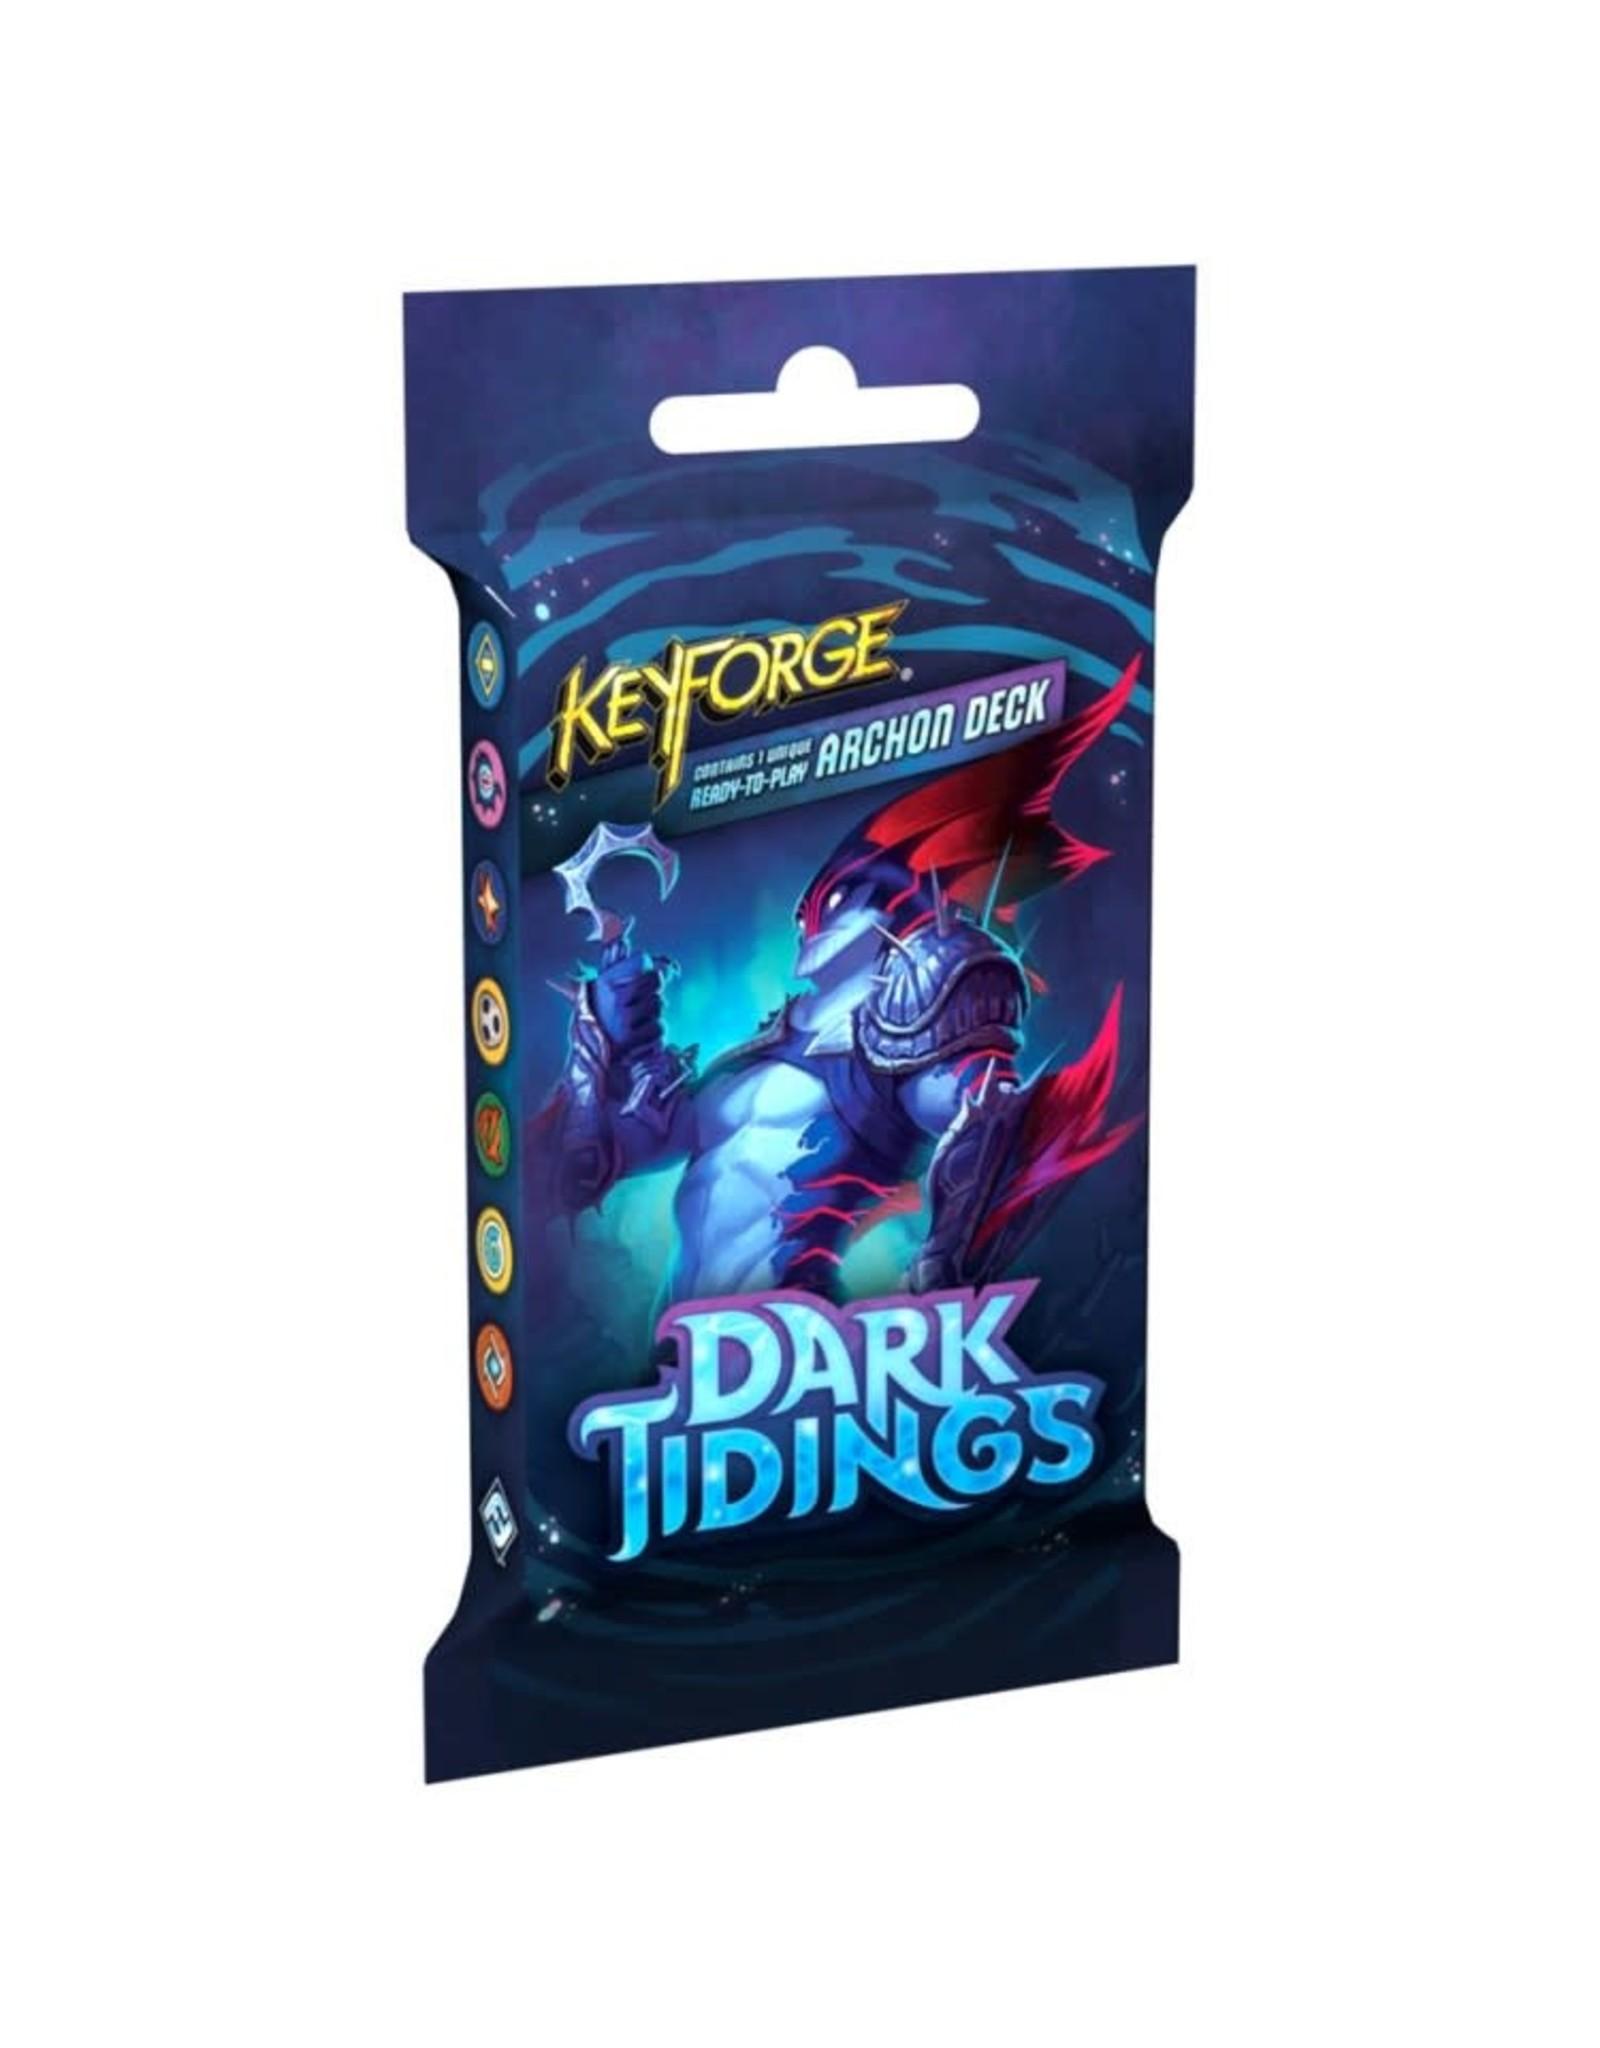 KeyForge: Dark Tidings: Archon Deck